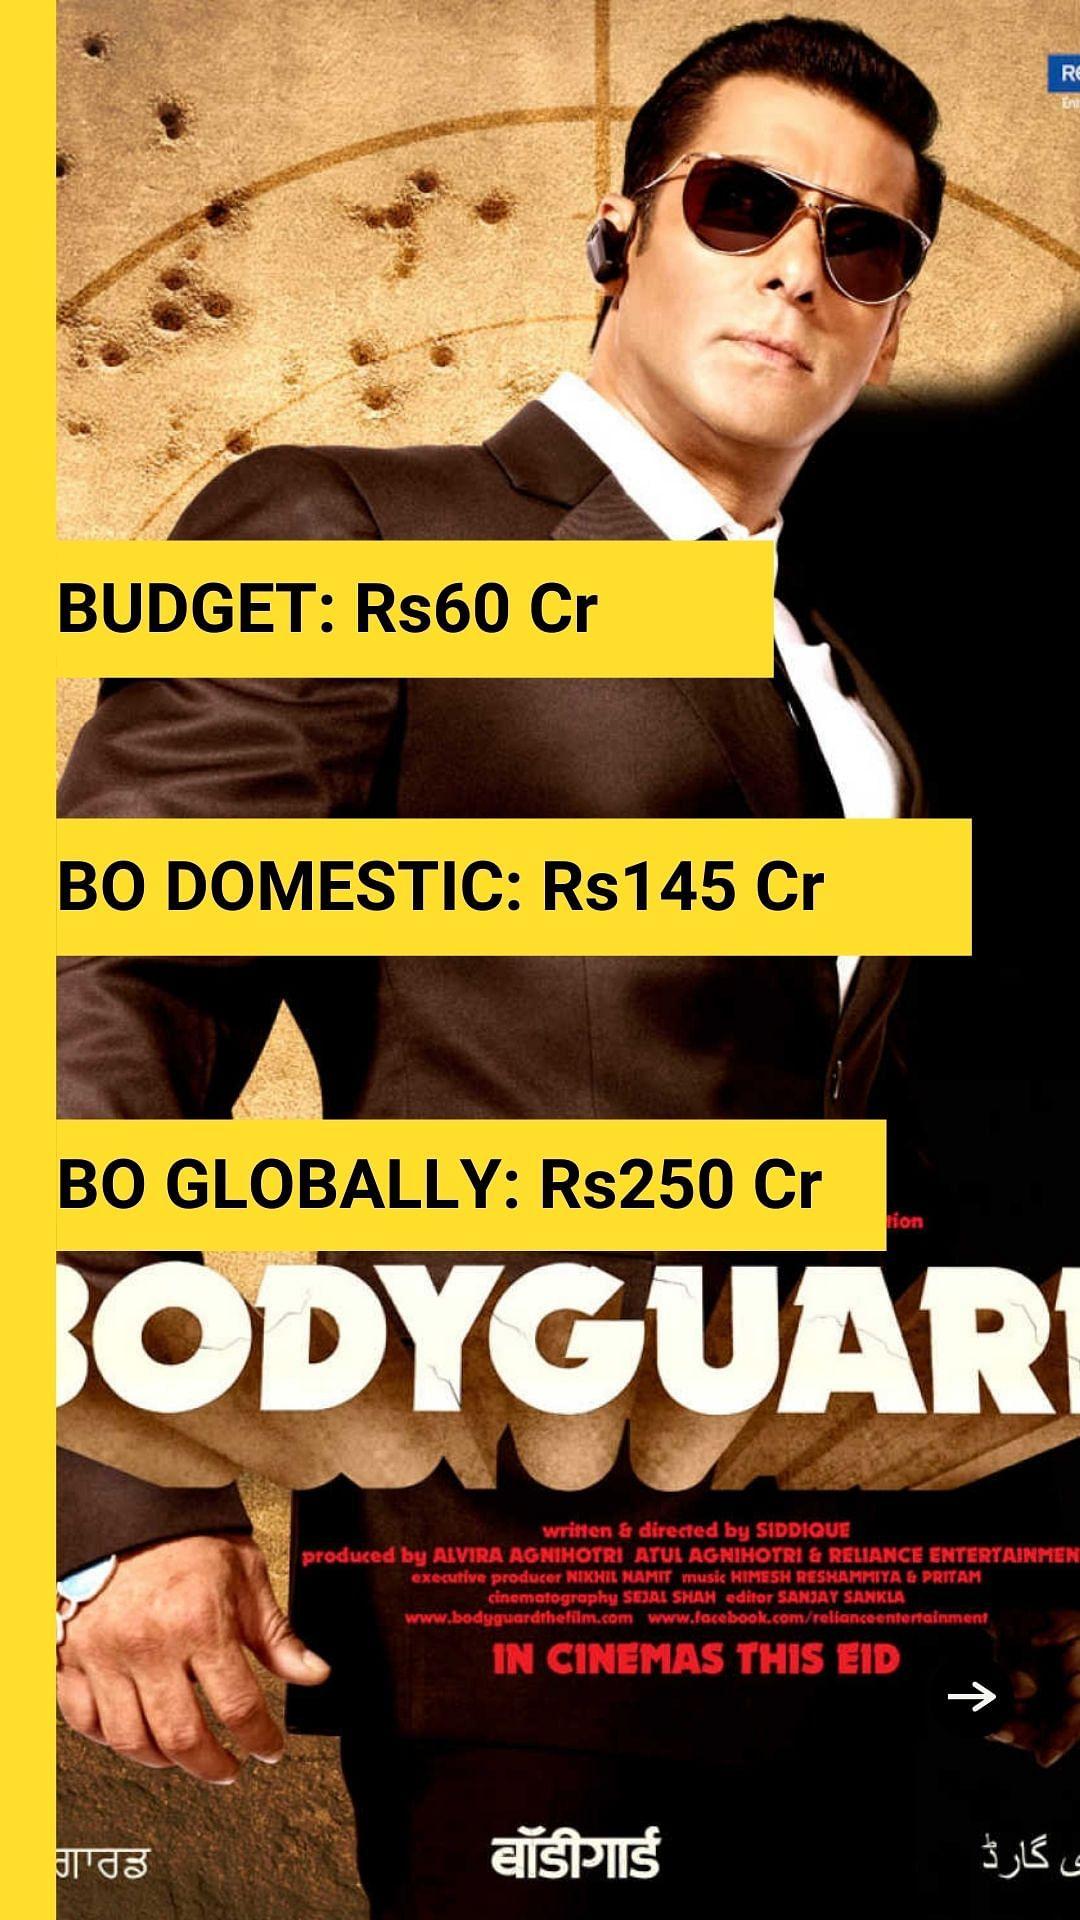 "<div class=""paragraphs""><p>Bodyguard (2011)</p></div>"